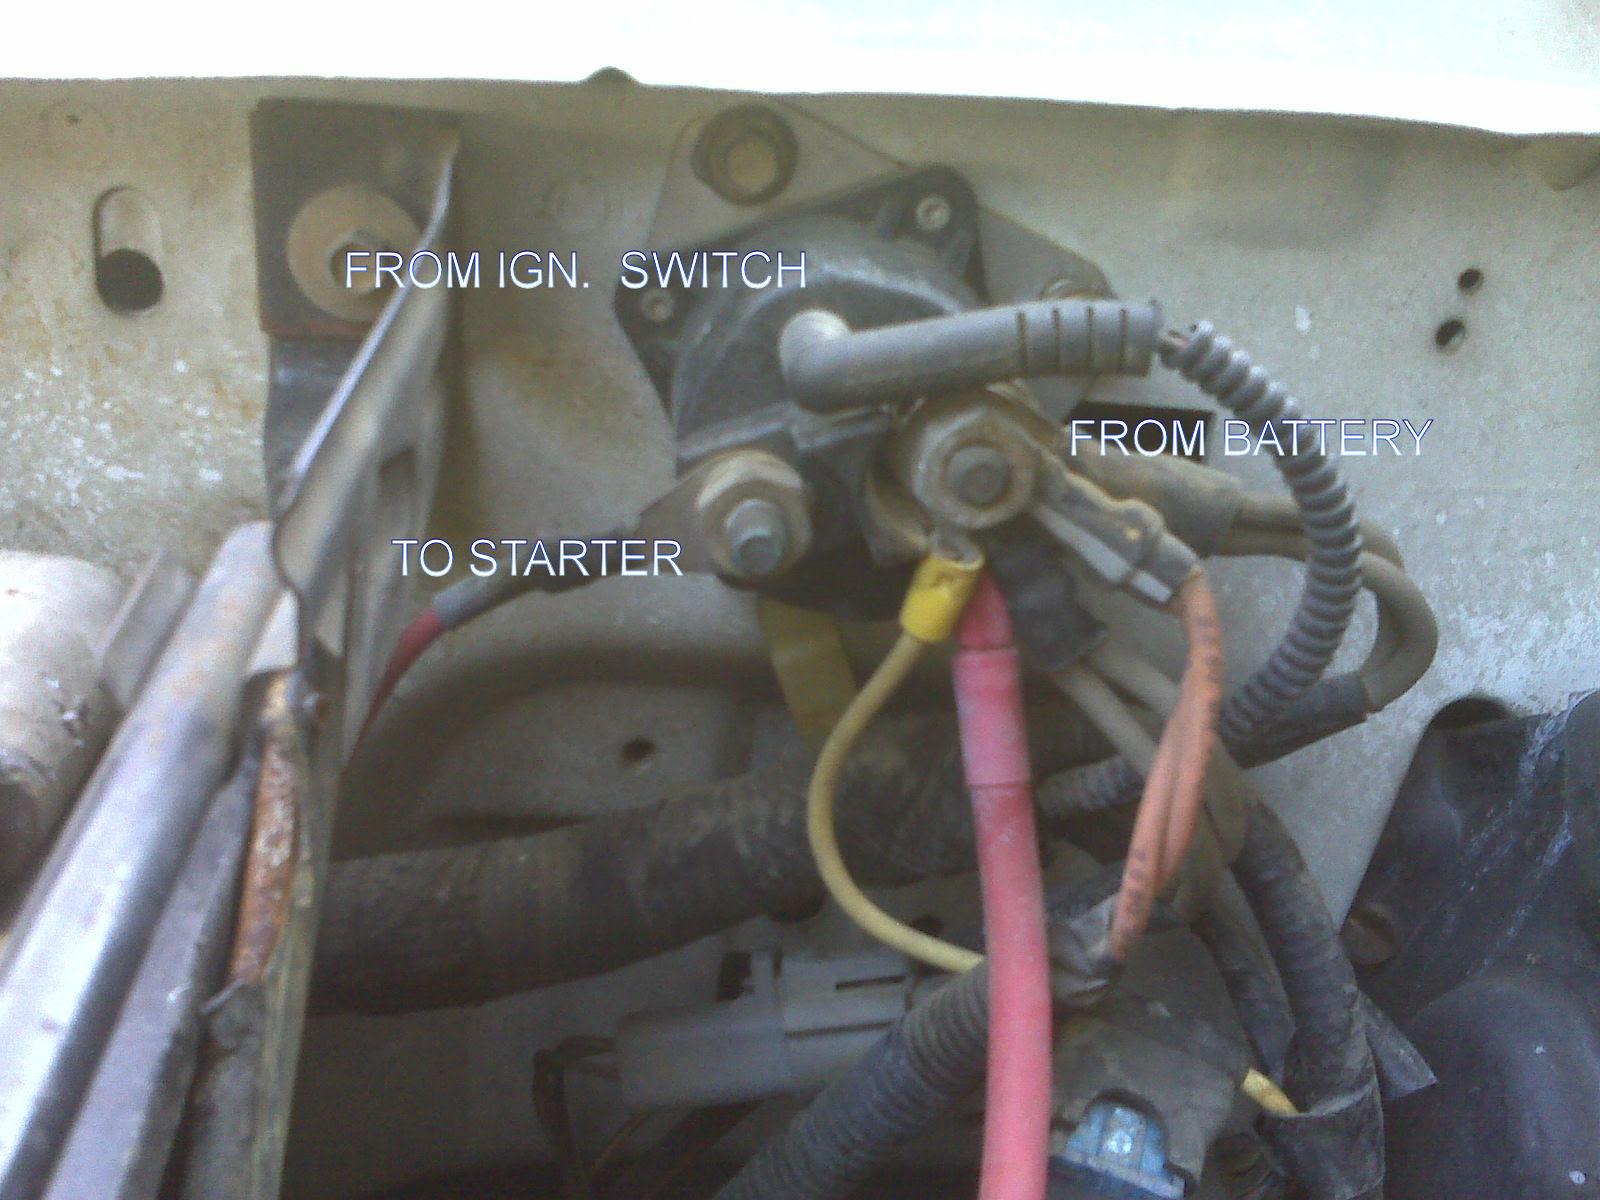 94 F150 Solenoid Wiring Diagram Onan Starter Solenoid Wiring Diagram Hecho Atv Ab14 Jeanjaures37 Fr